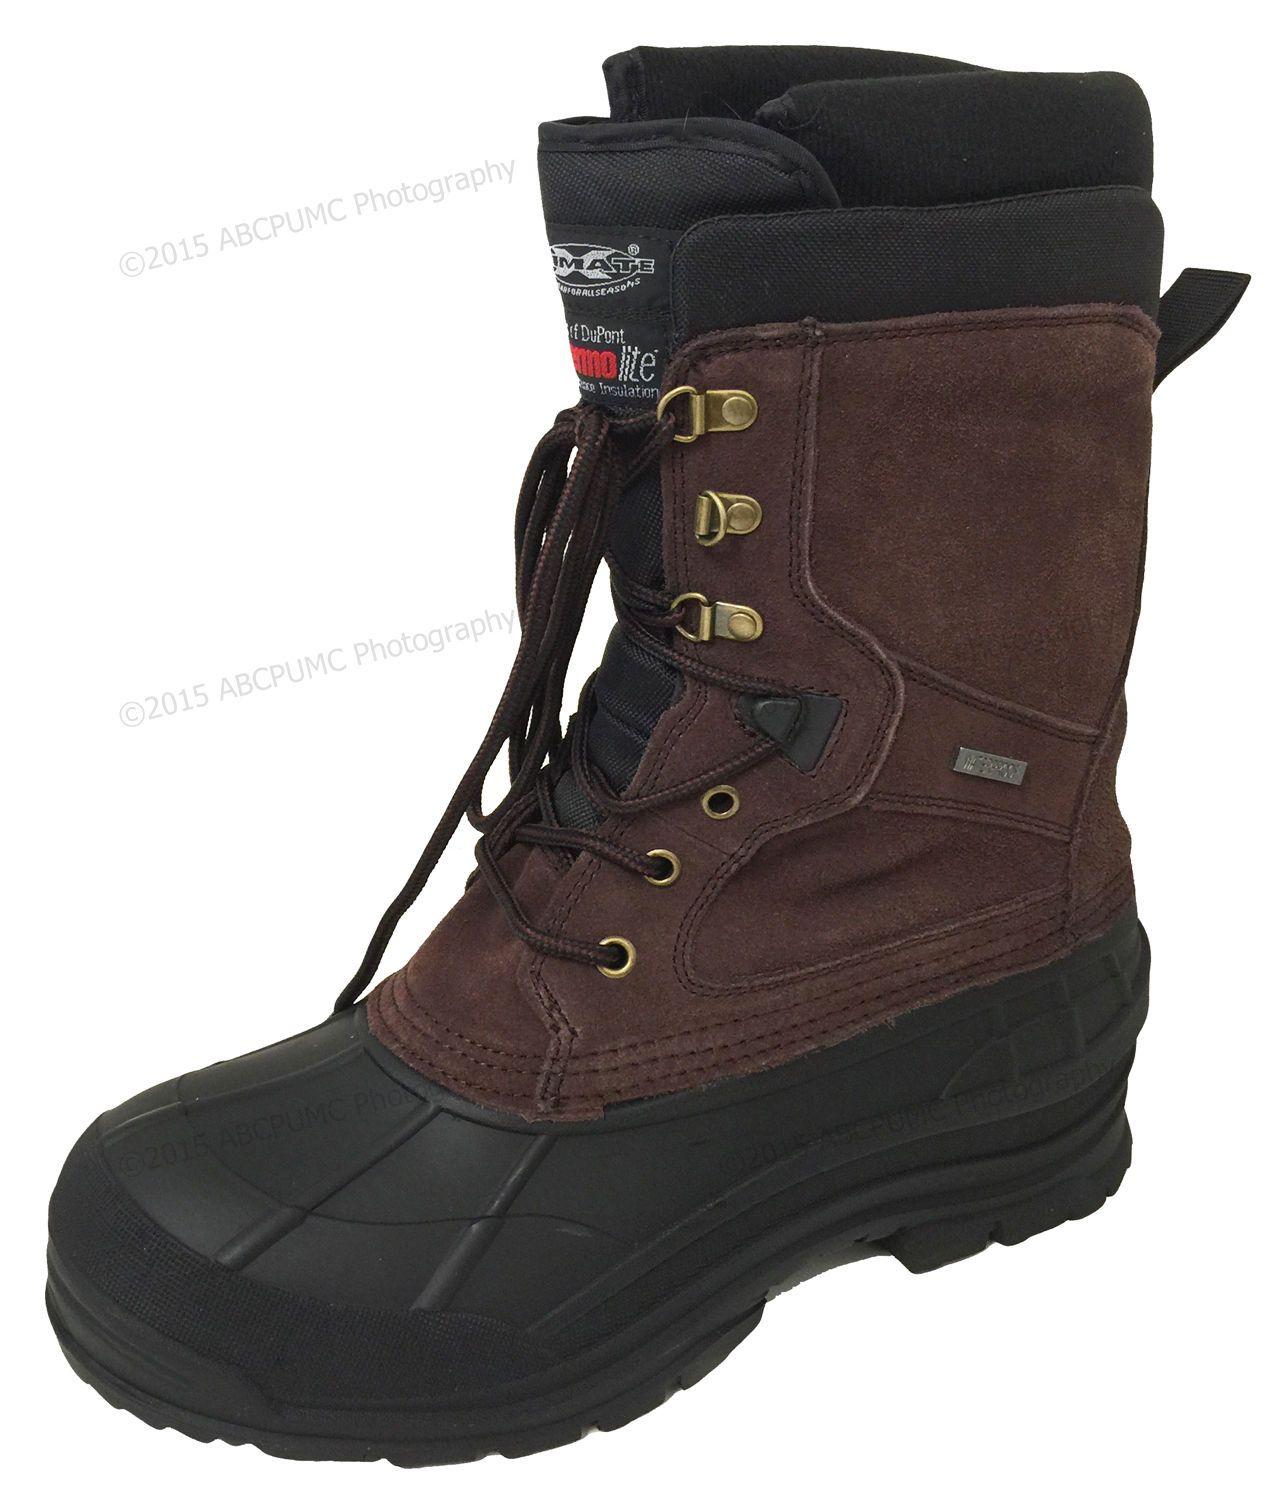 afe902c08 Mens Winter Boots 10